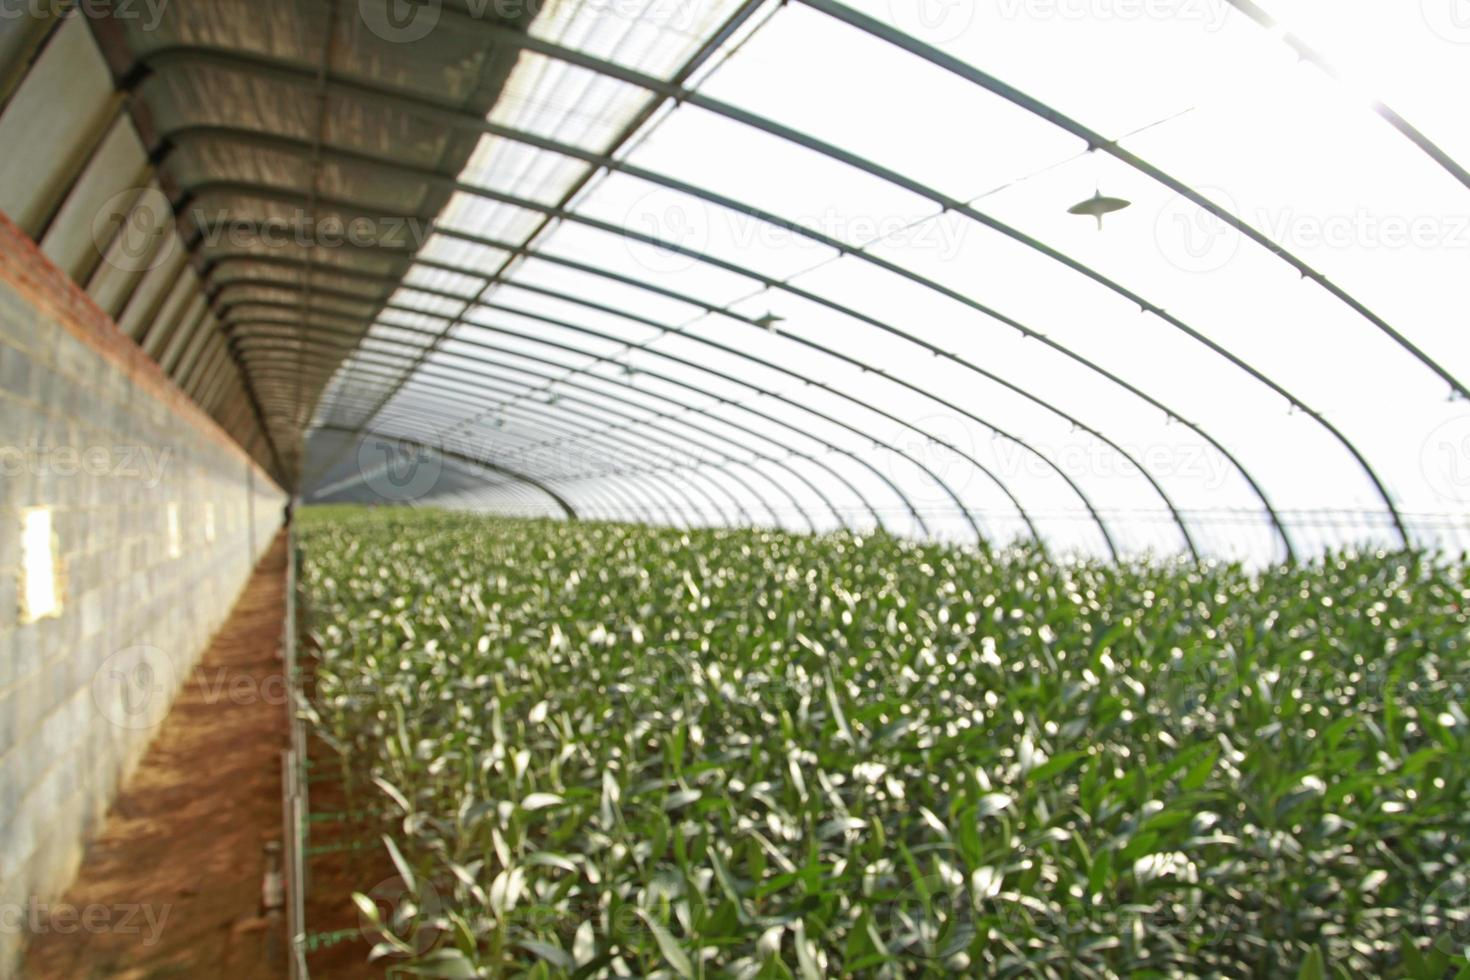 lelies worden geplant in kassen foto